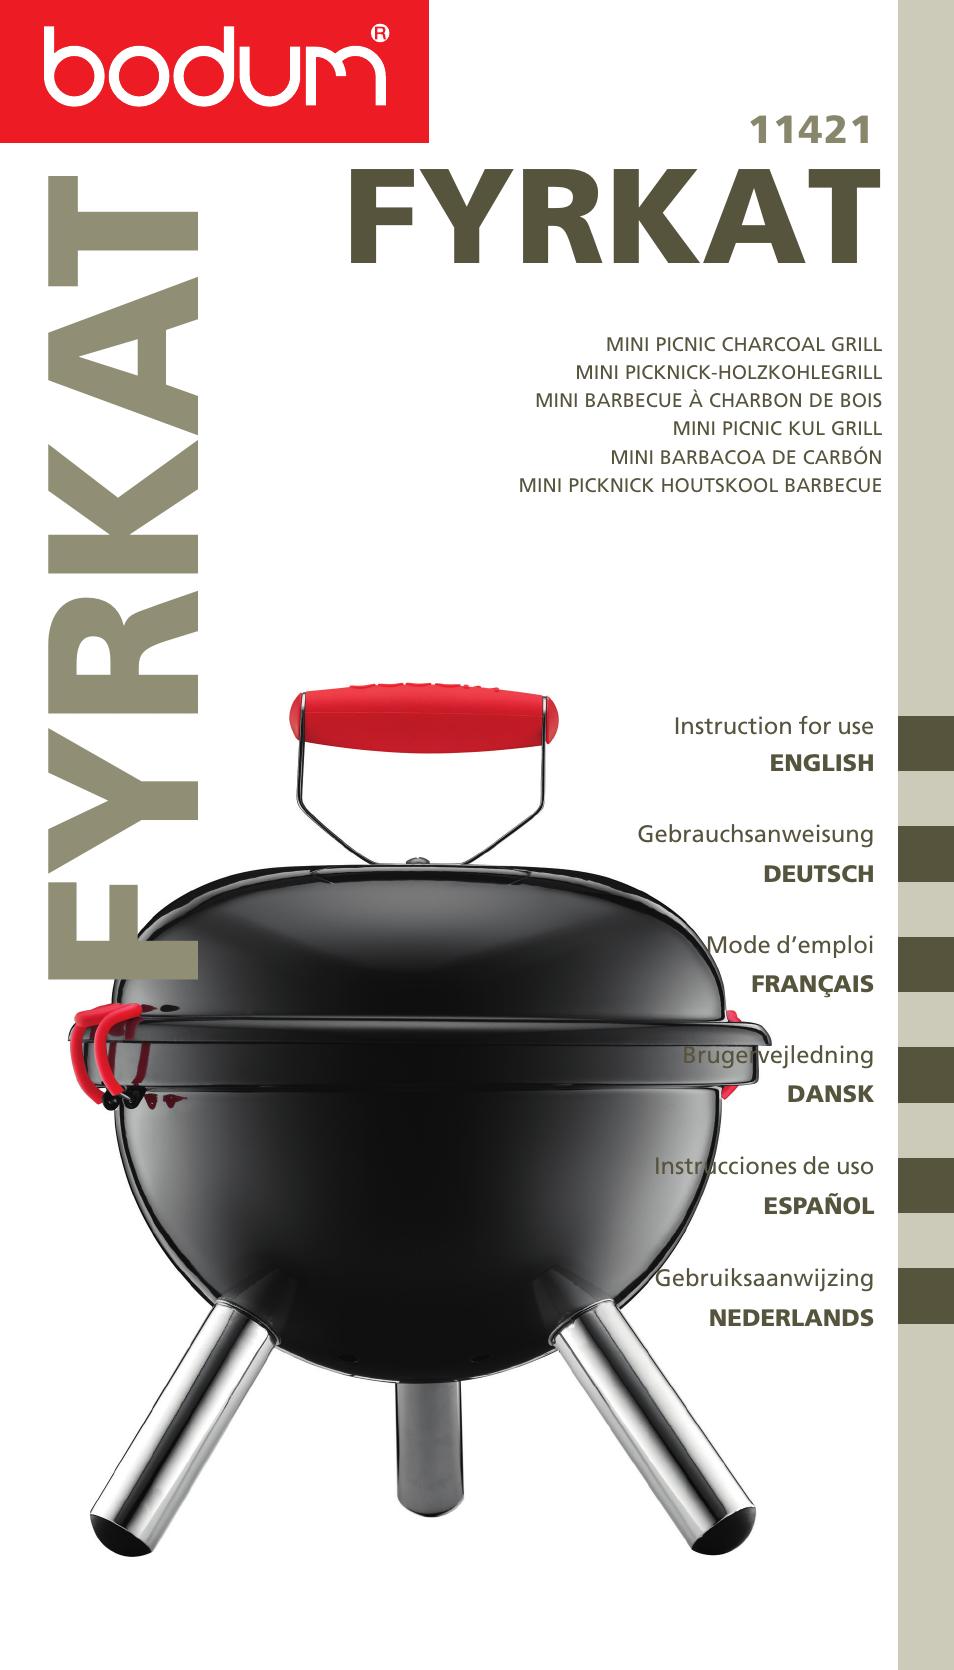 bodum mini picnic charcoal grill 11421 user manual 39 pages manual camara nikon d5000 español manual nikon d5000 en español gratis